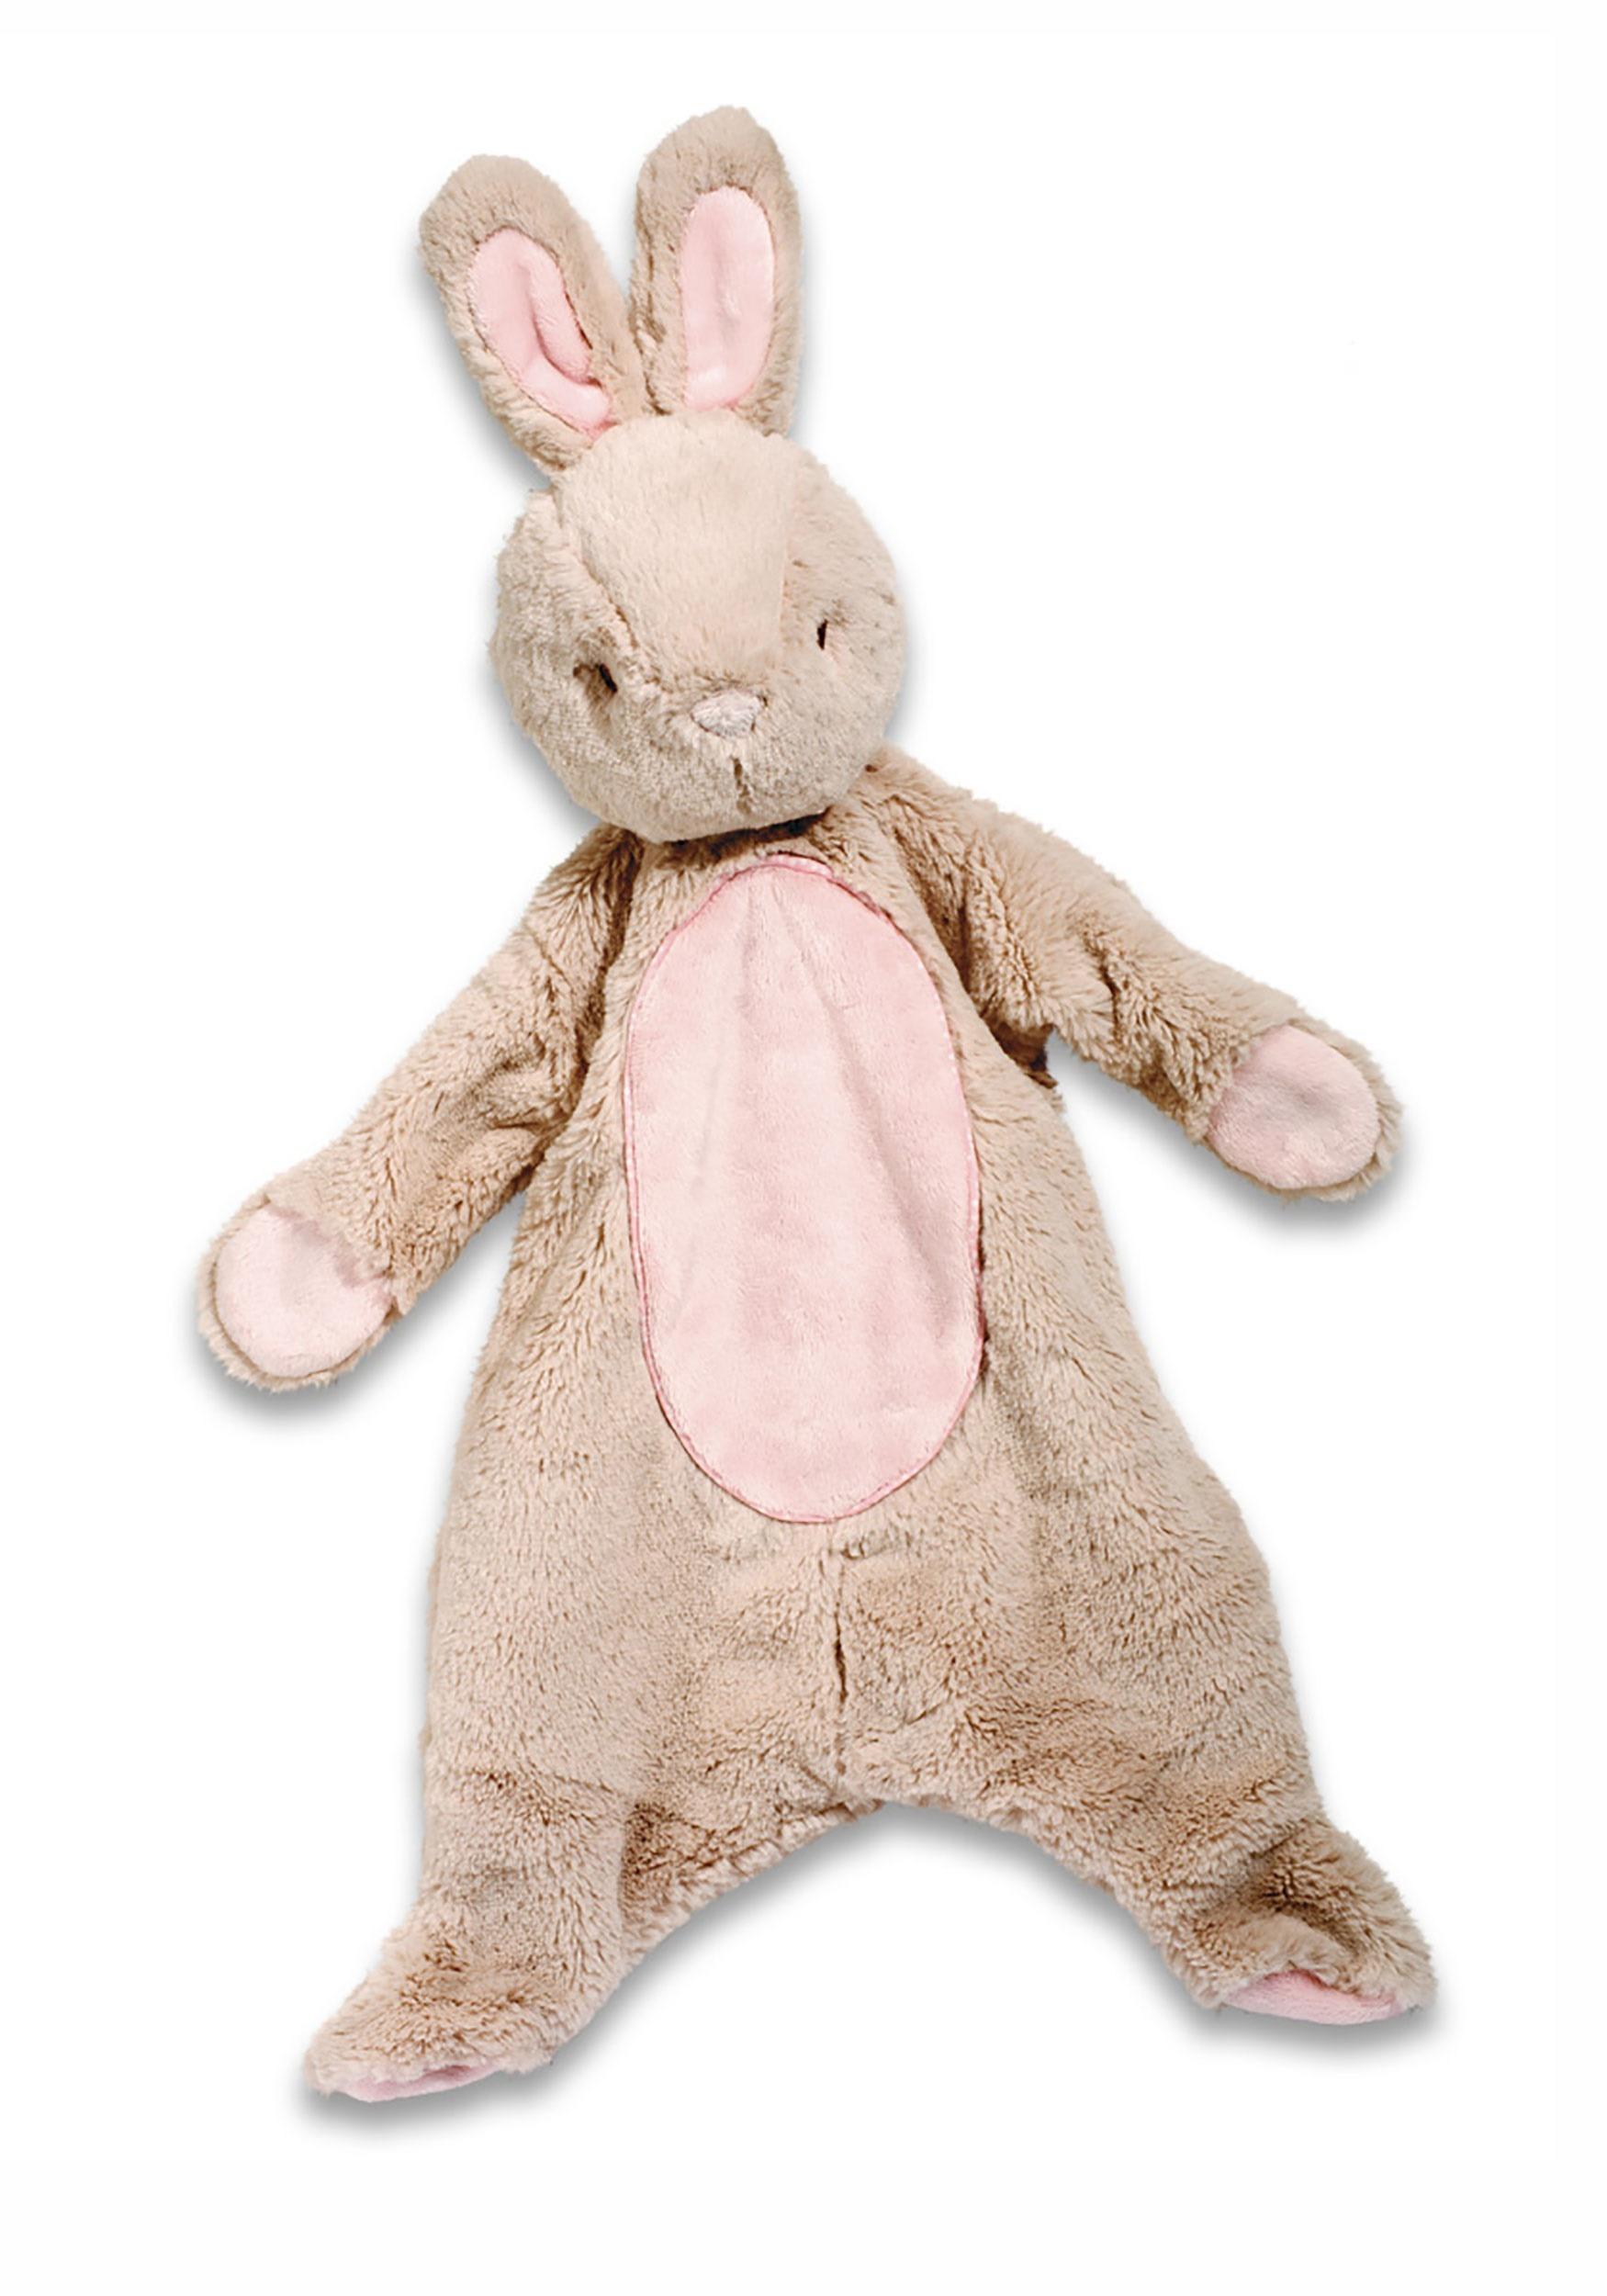 Infant Bunny Sshlumpie Plush Blankie